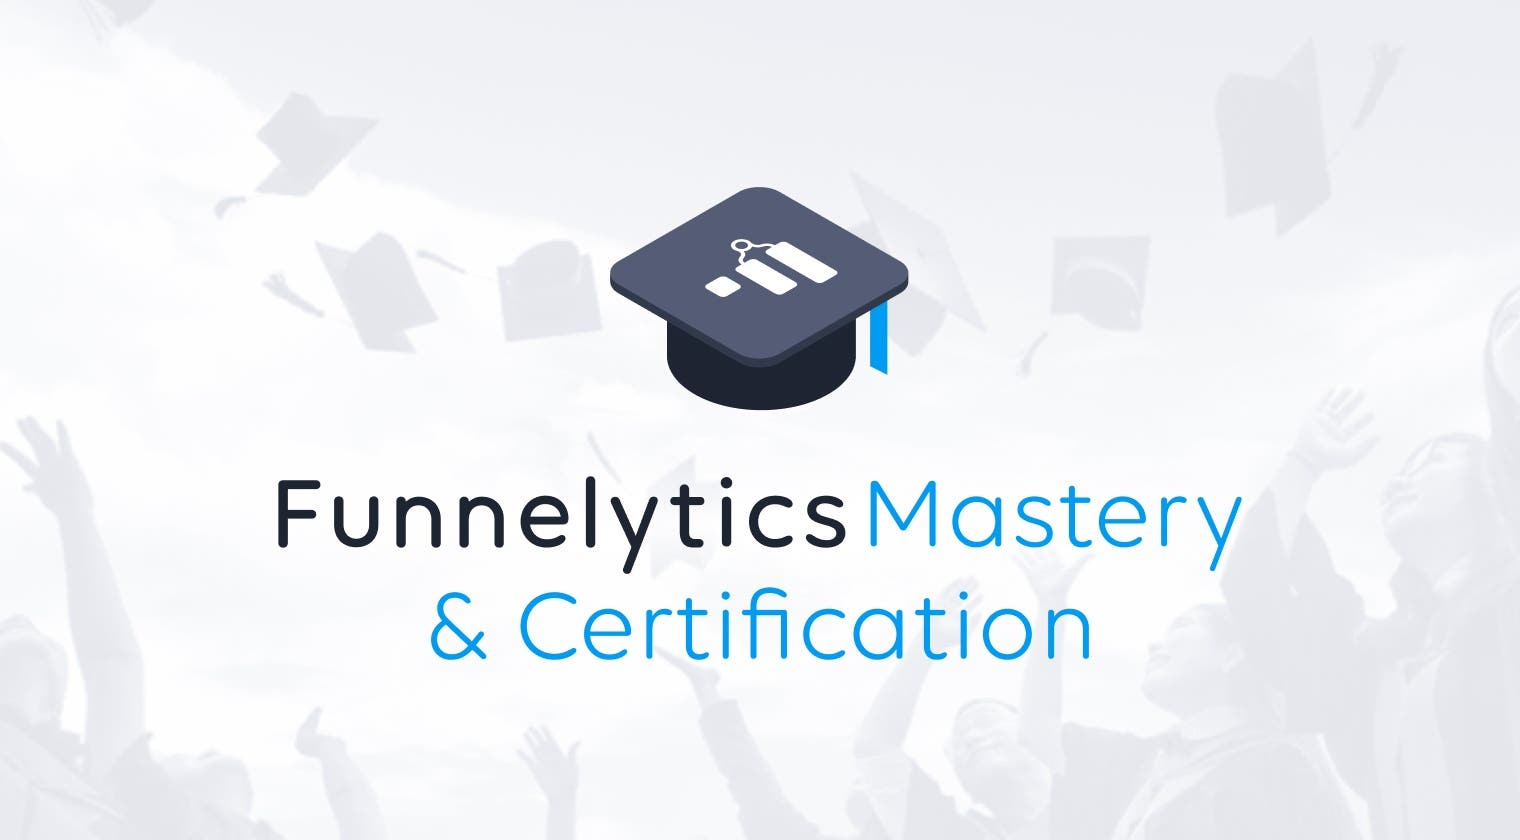 Funnelytics Mastery